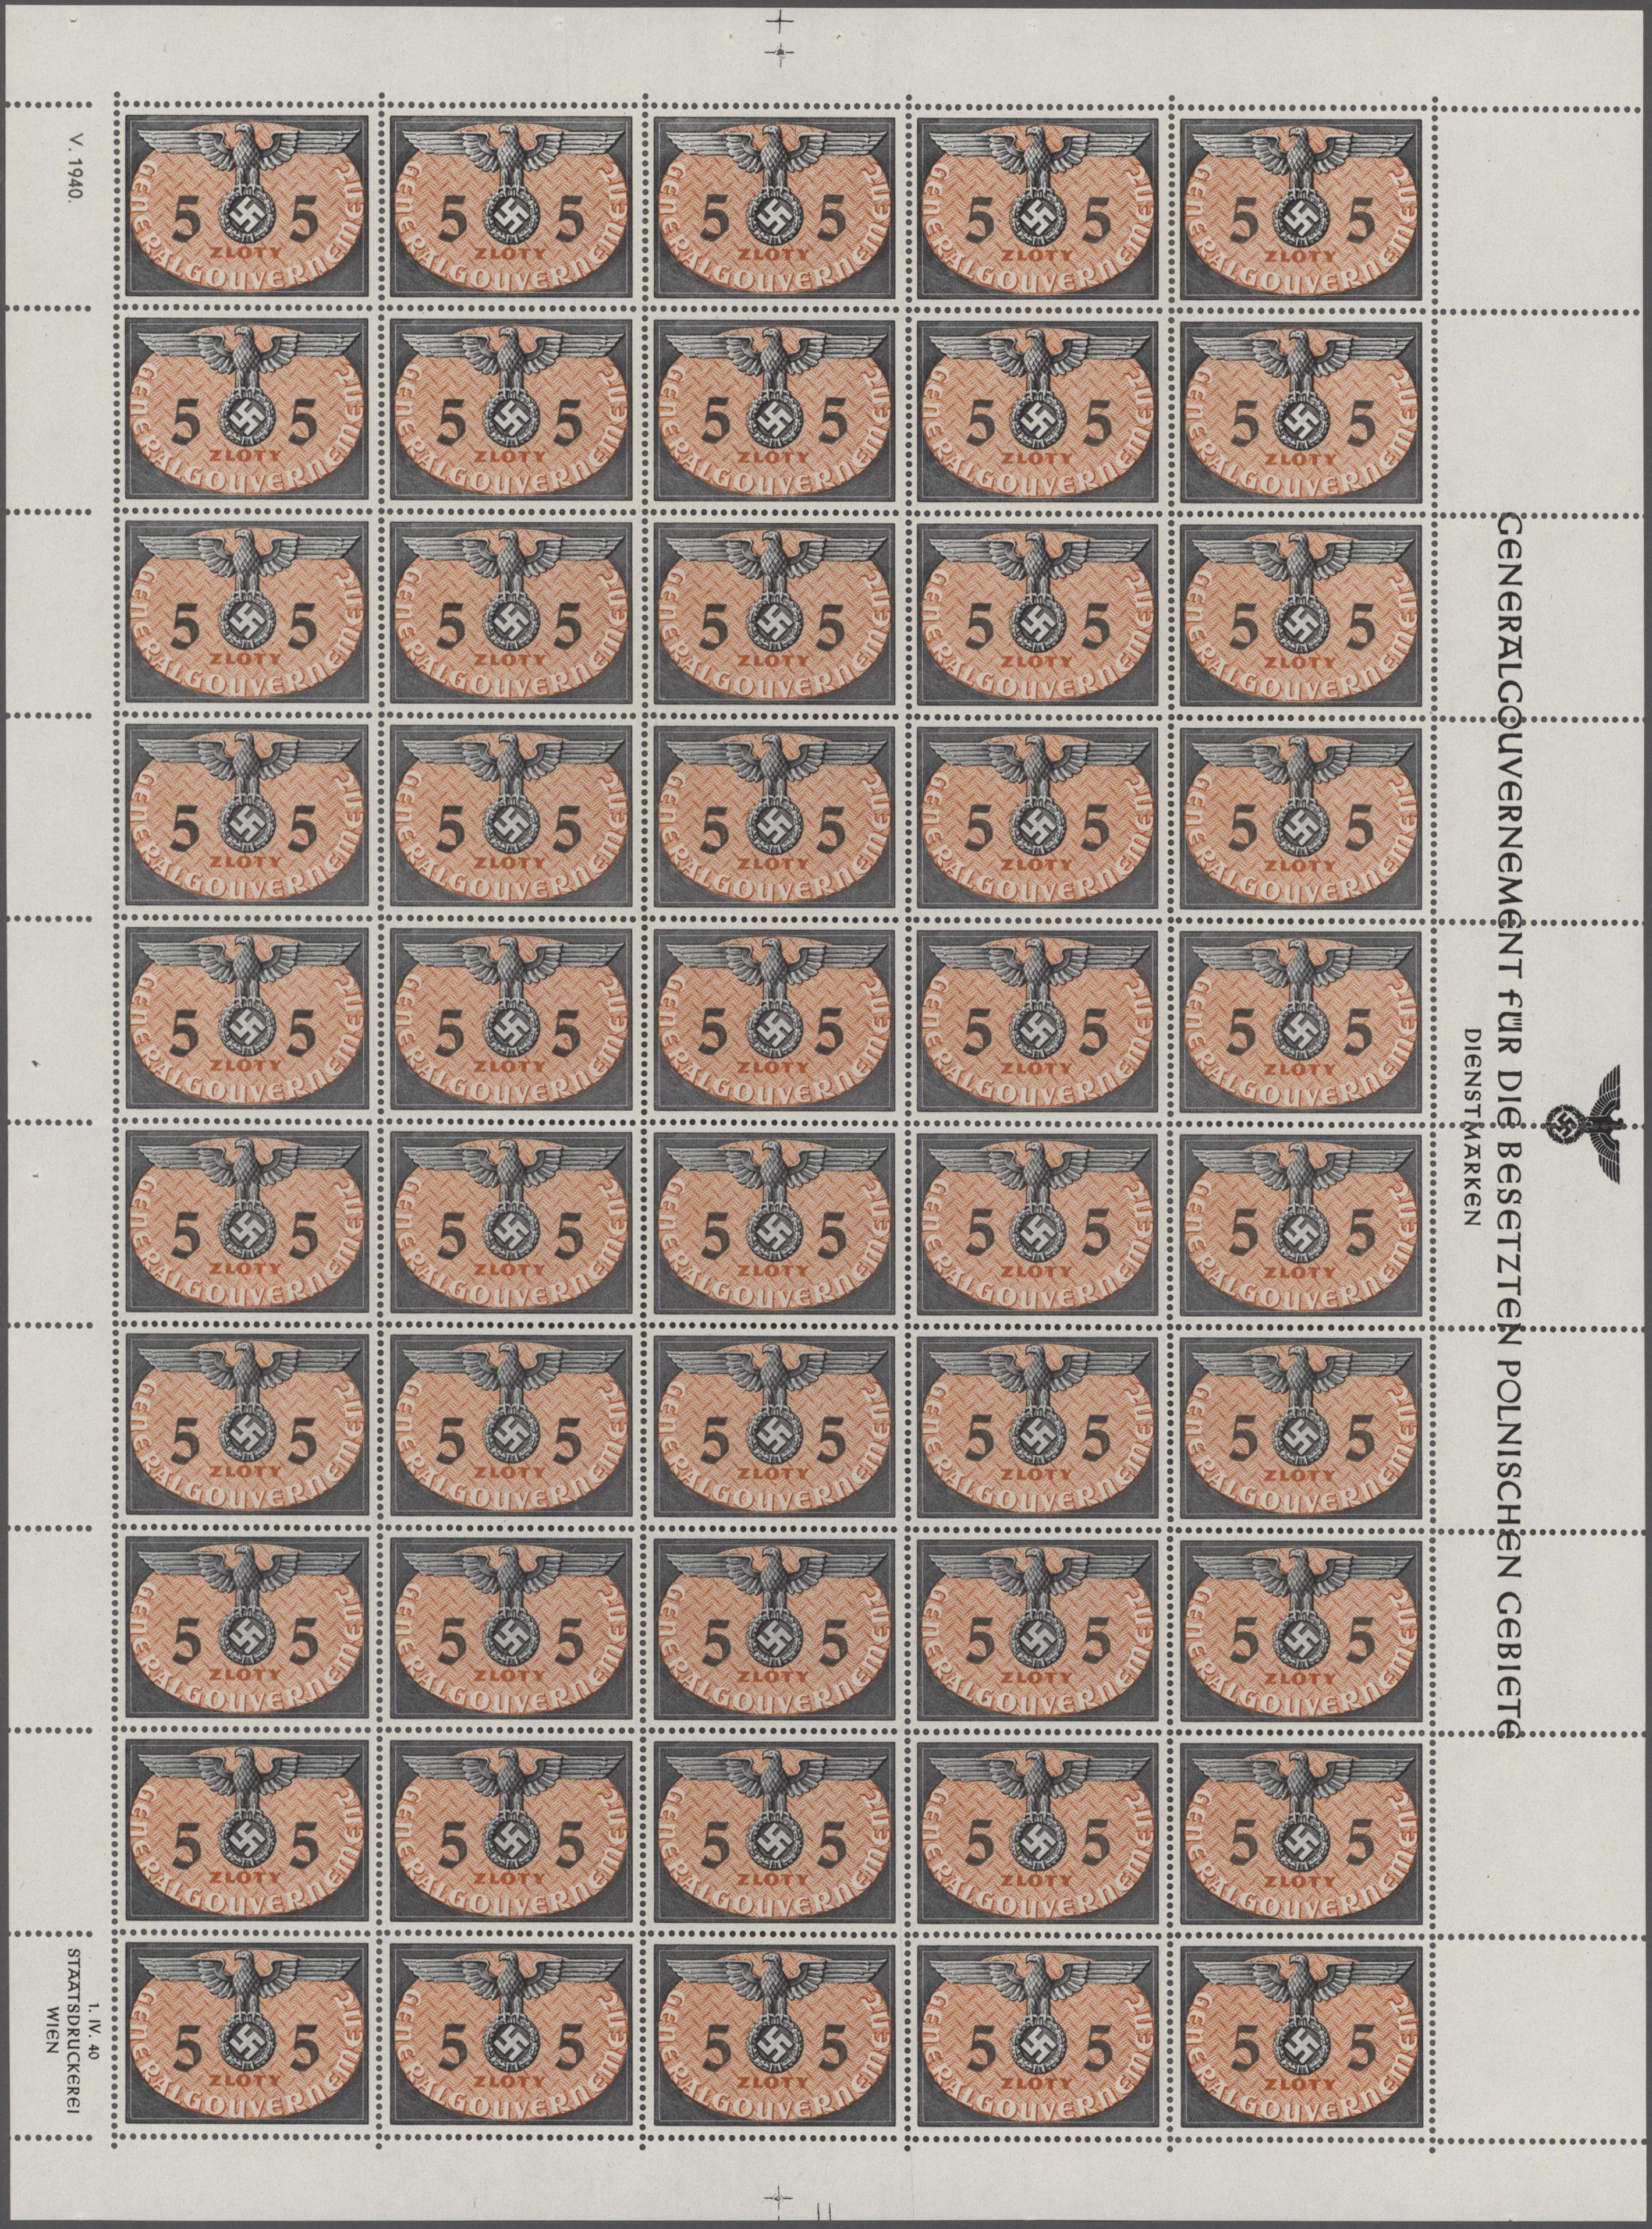 Lot 27485 - Dt. Besetzung II WK - Generalgouvernement - Dienstmarken  -  Auktionshaus Christoph Gärtner GmbH & Co. KG Sale #46 Gollcetions Germany - including the suplement